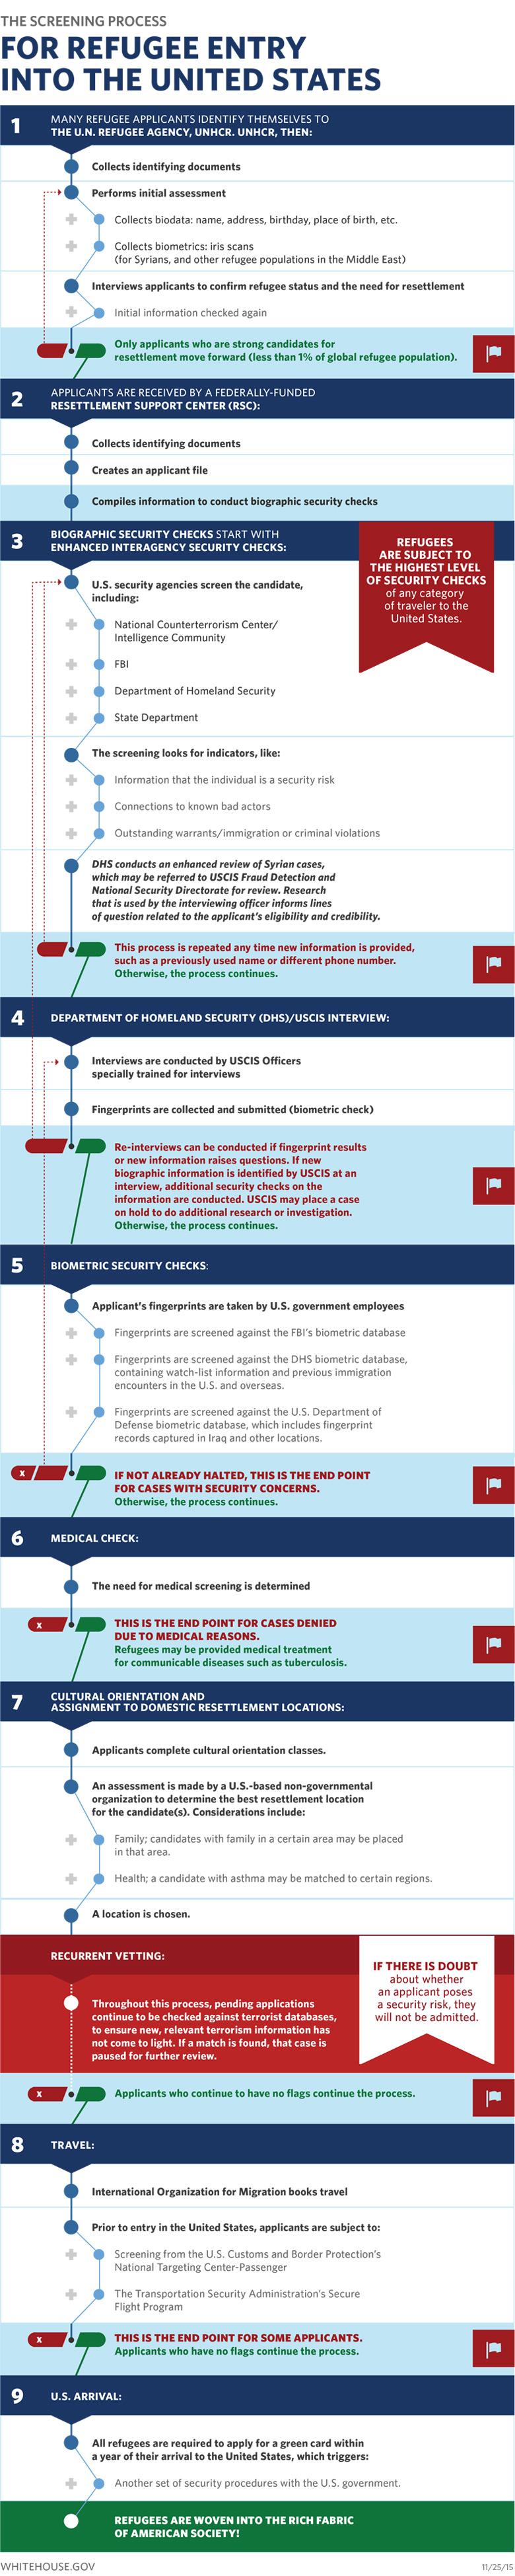 Infographic credit: Whitehouse.gov